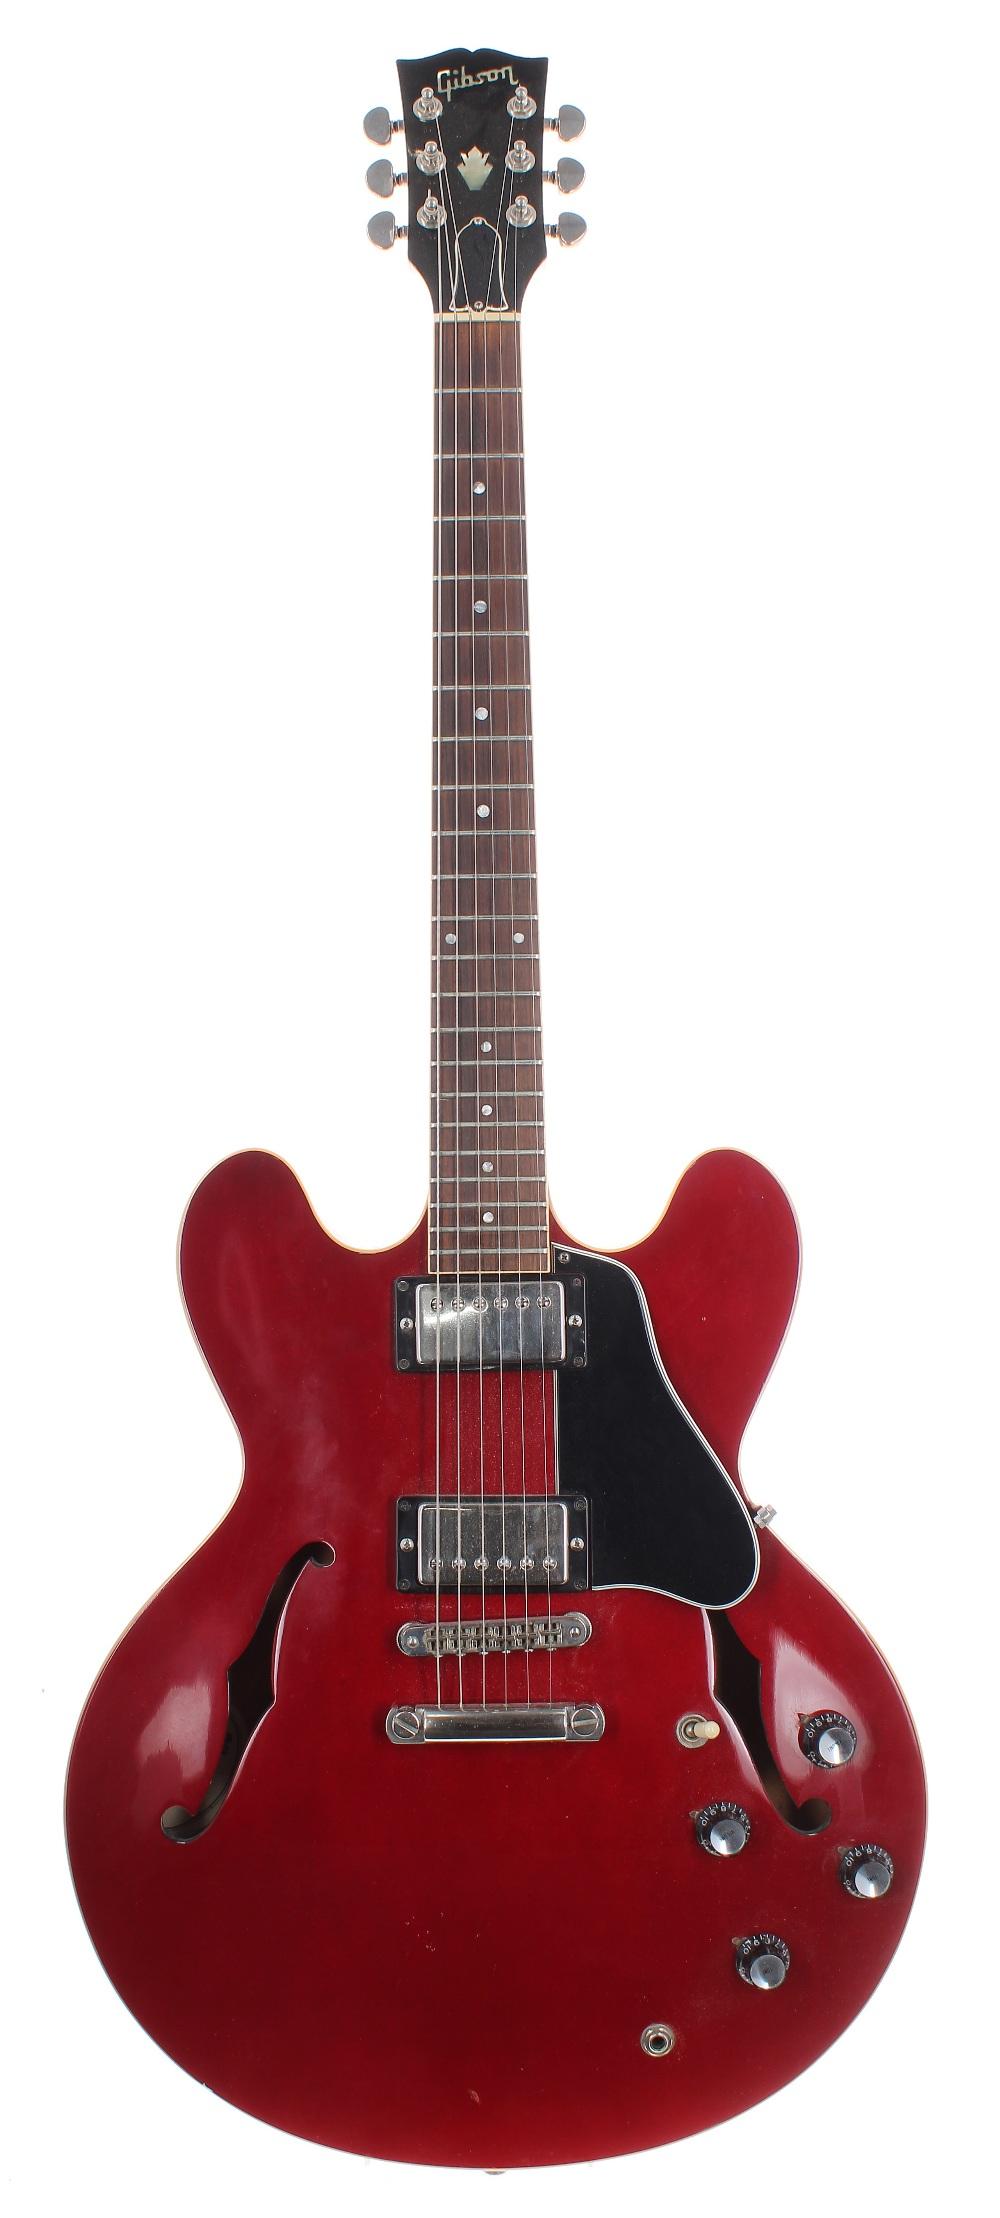 1989 Gibson ES335 Dot semi-hollow body electric guitar, made in USA, ser. no. 8xxx9xx5; Finish: